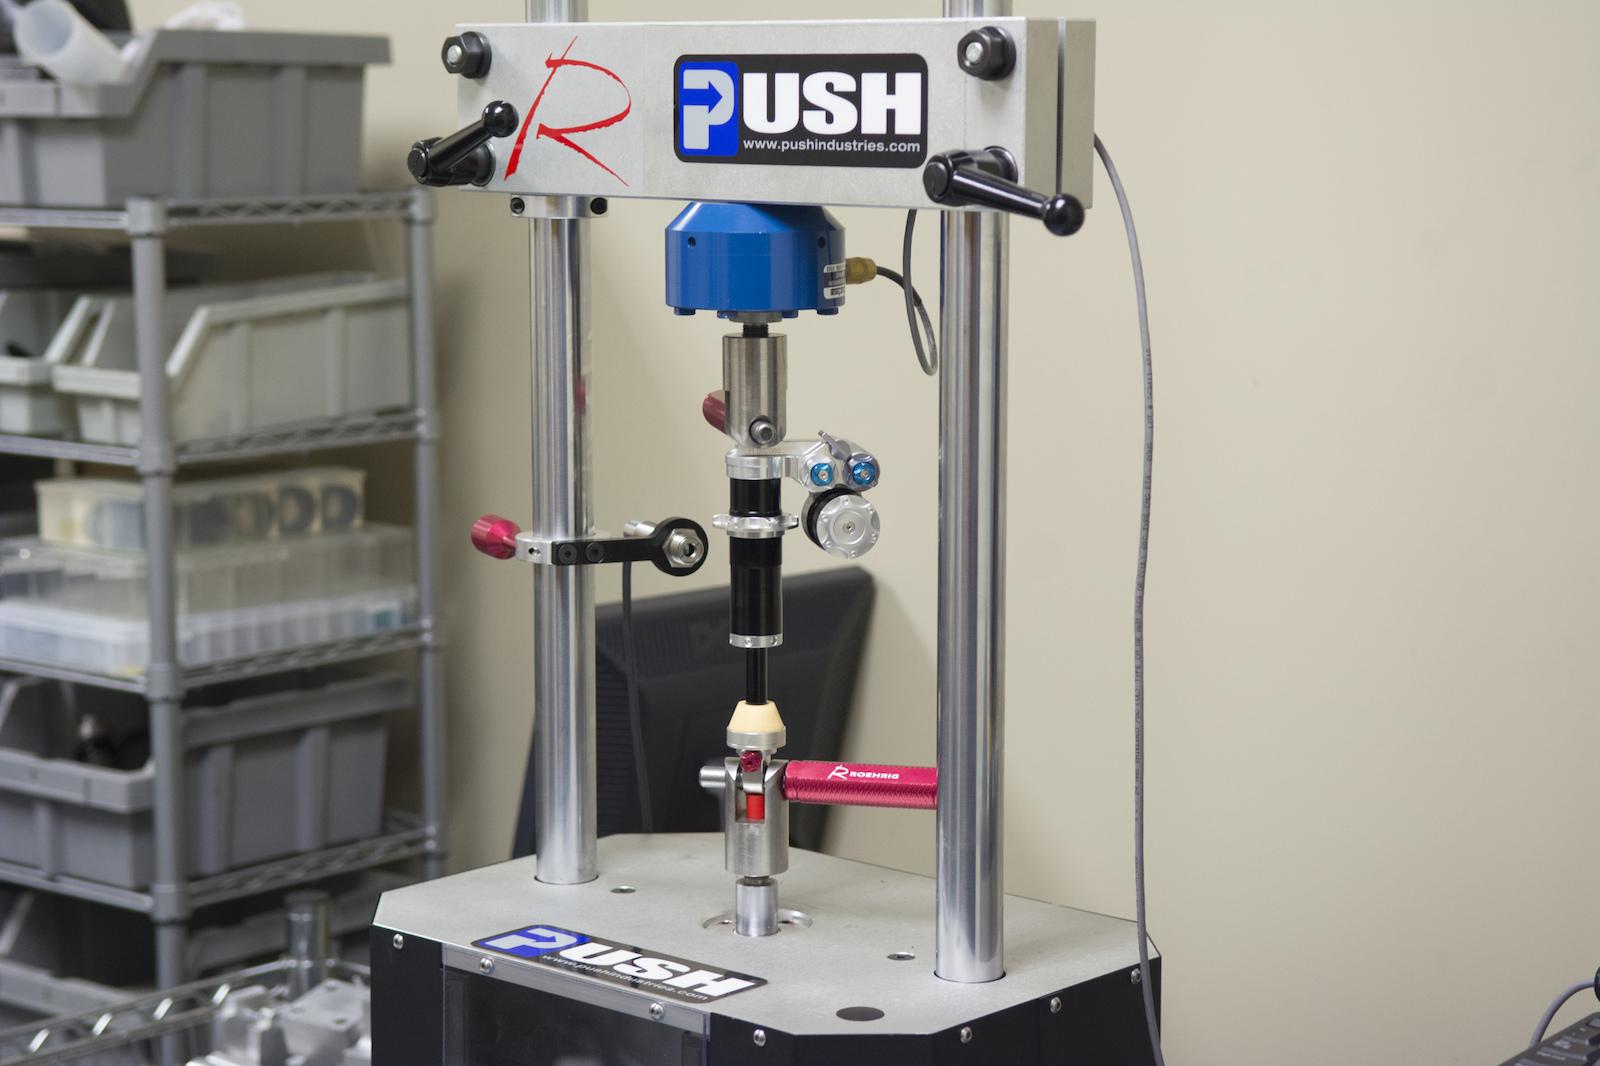 Inside Push Industries